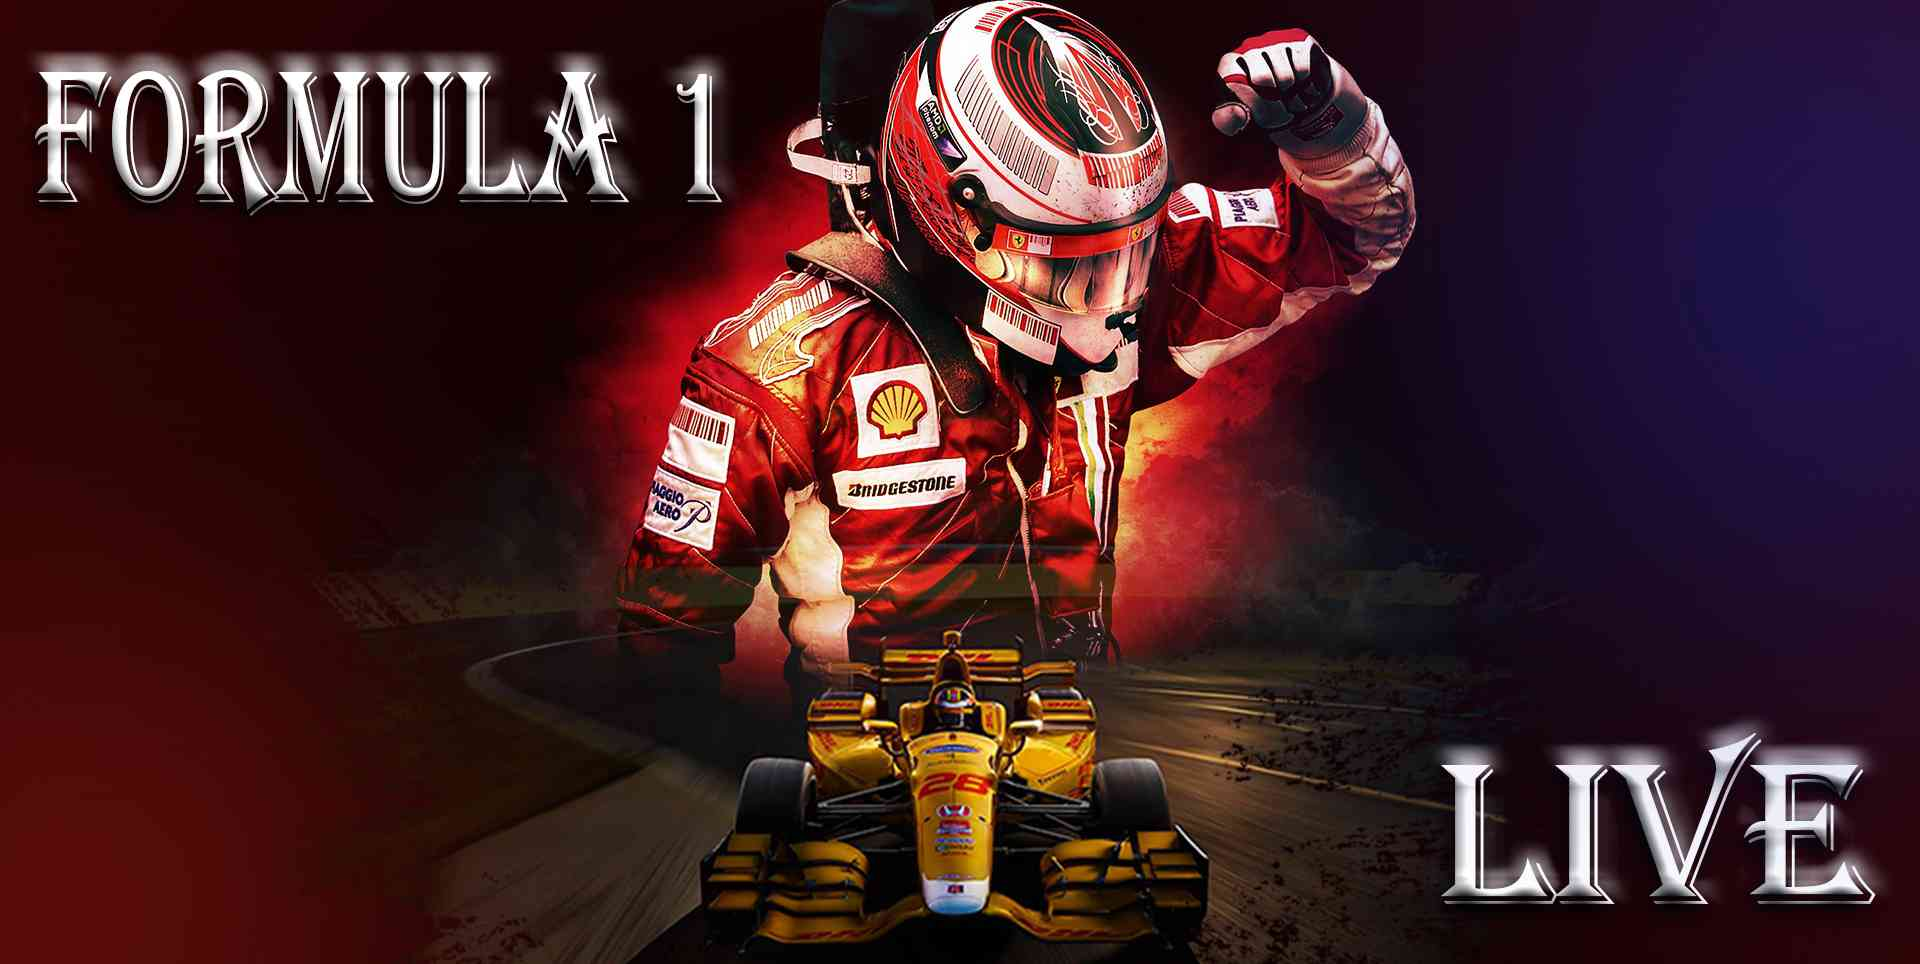 F1 Singapore Grand Prix 2018 Live Stream